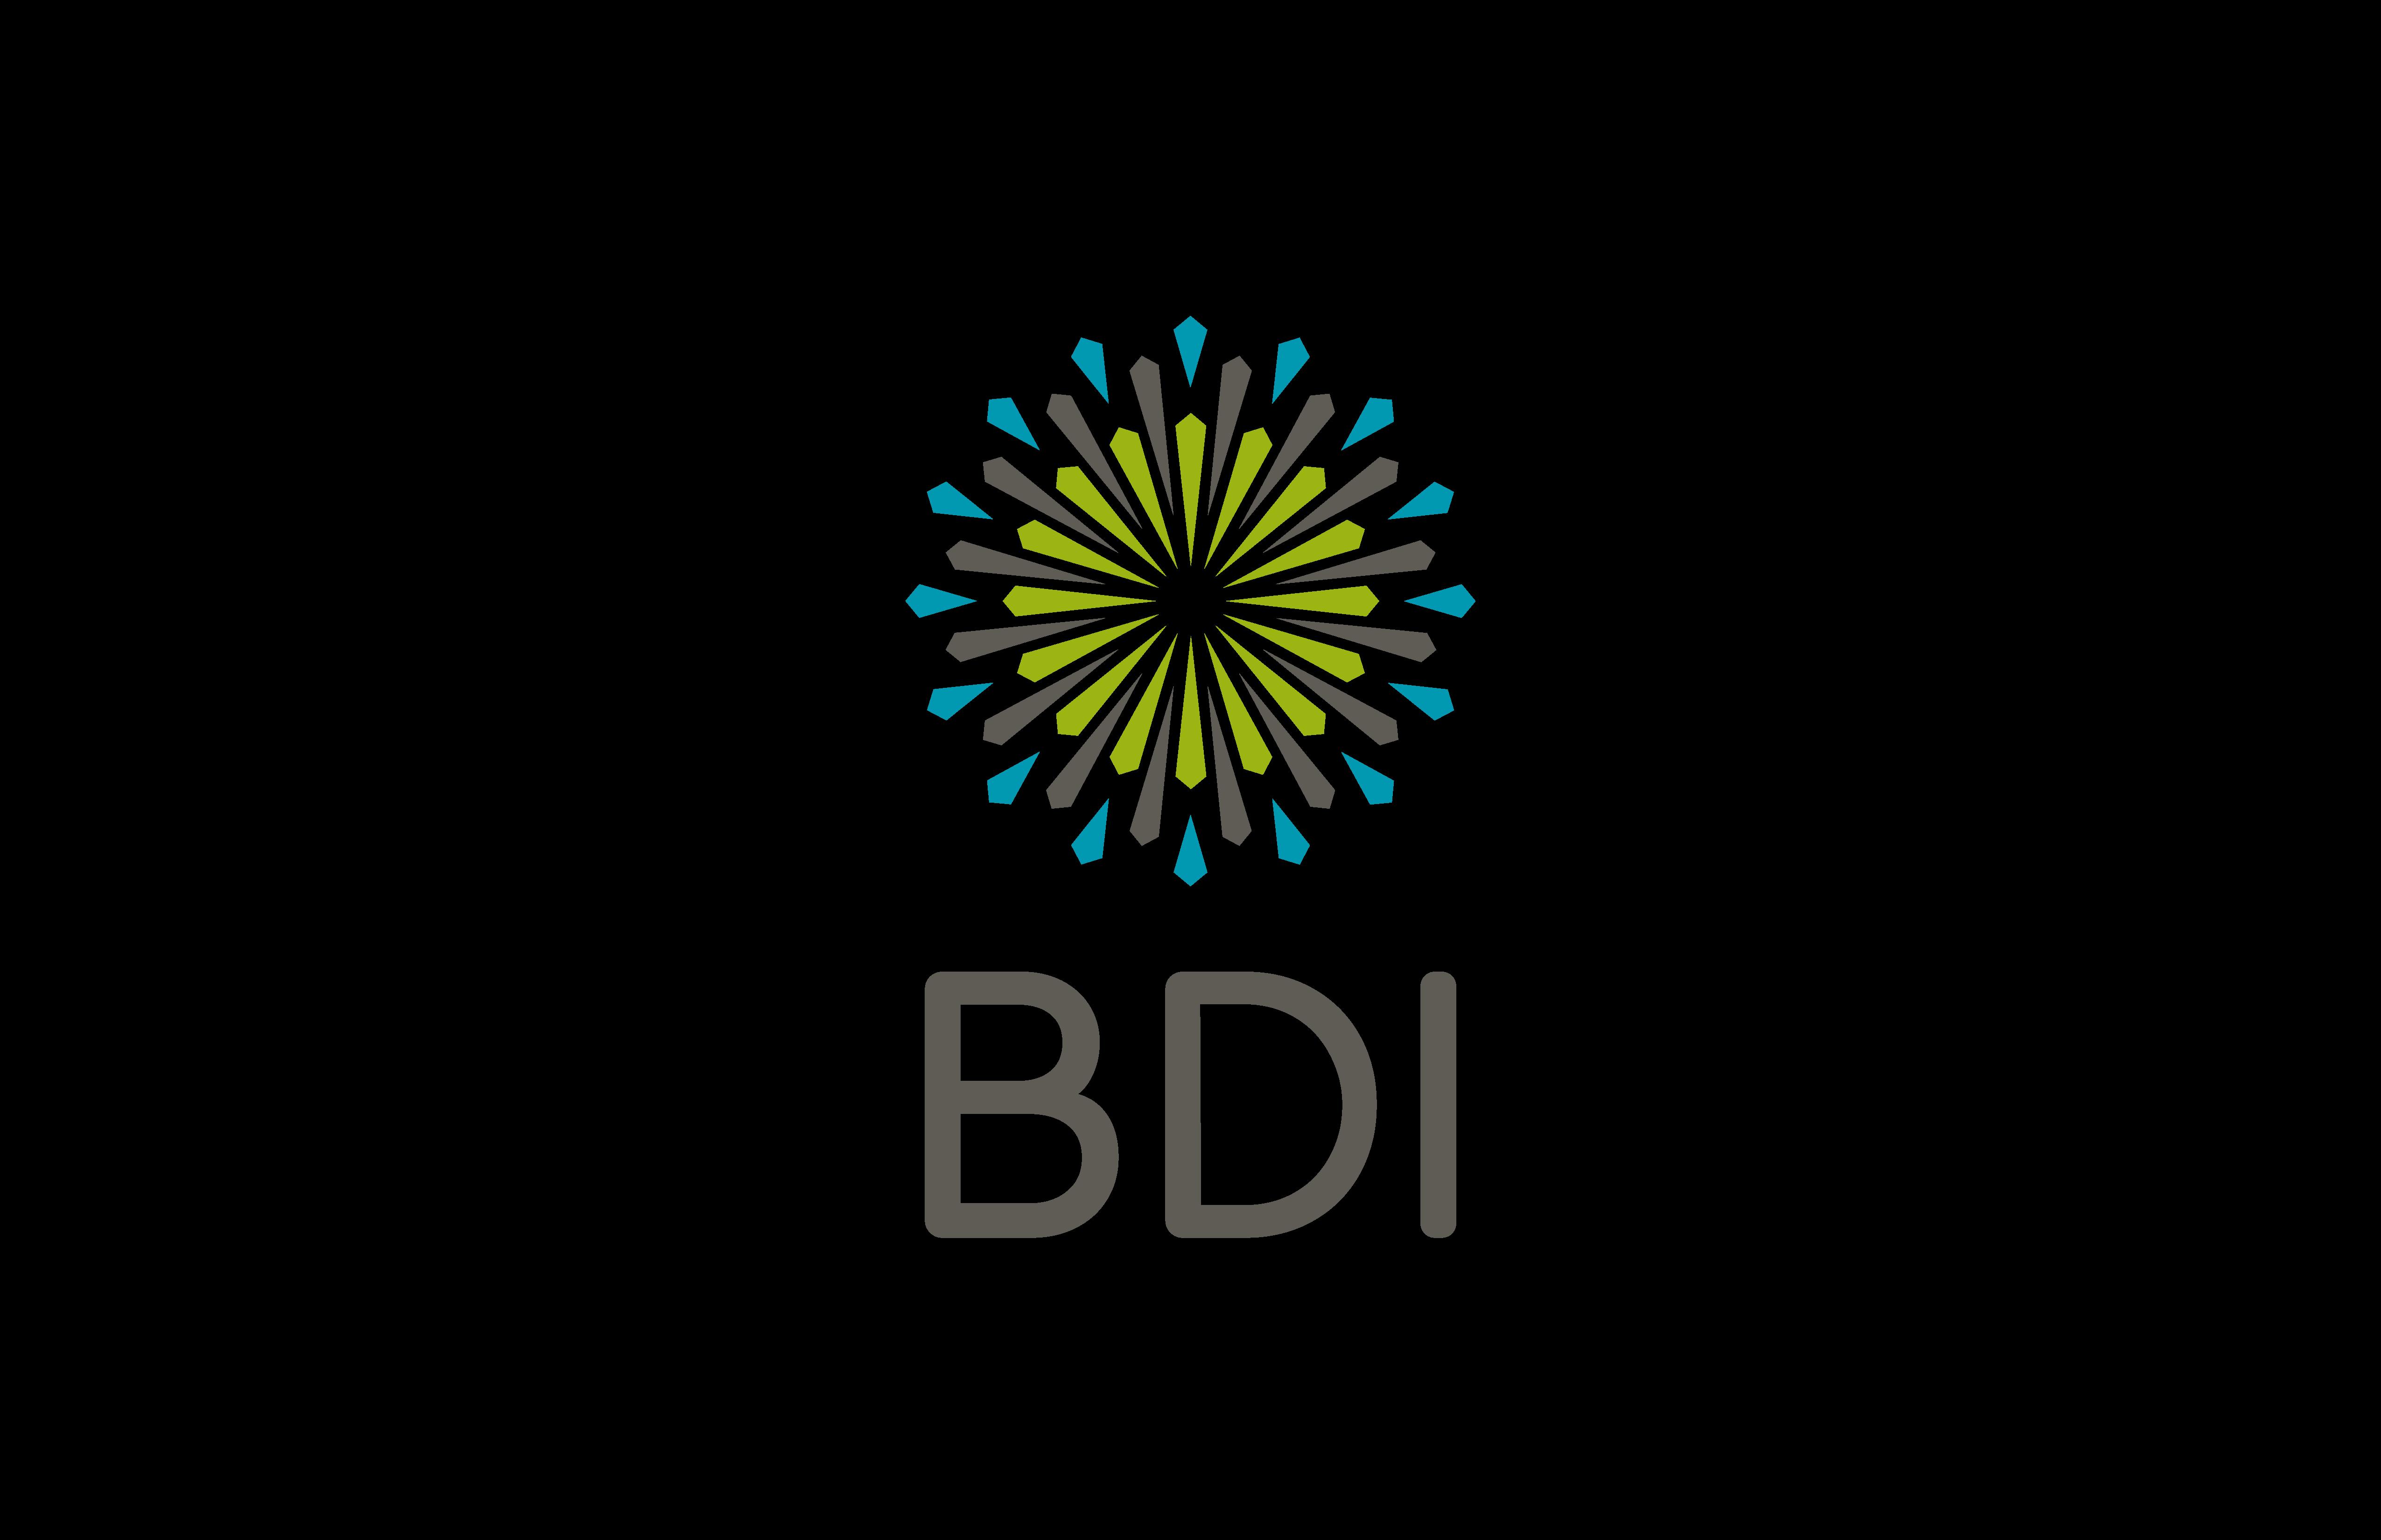 Bobby Dodd Institute, Inc. Company Logo